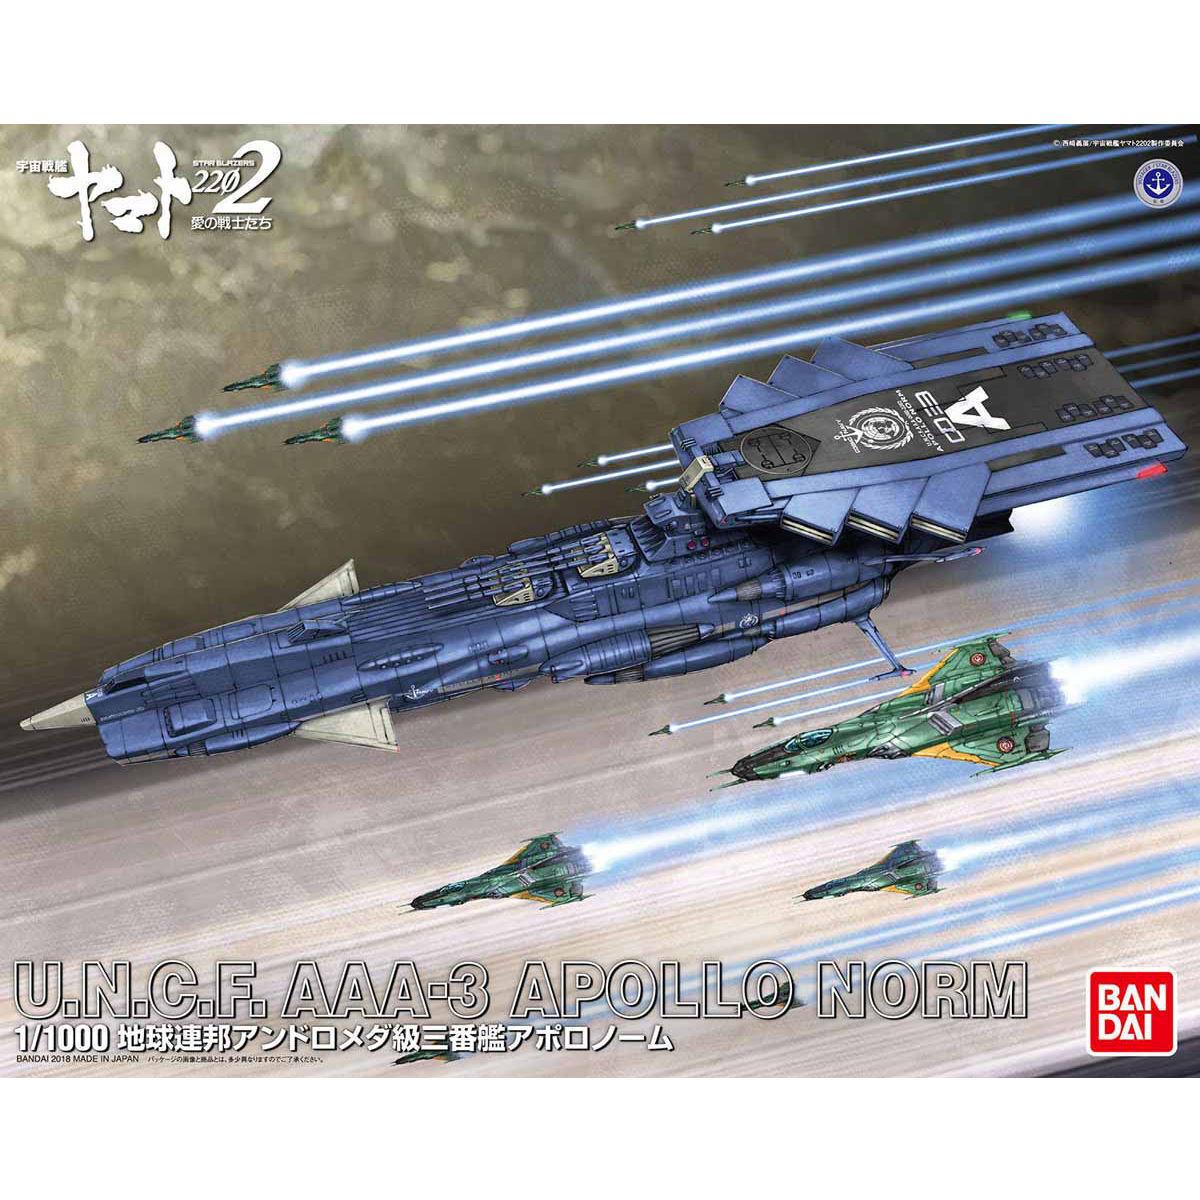 BANDAI 1 1000 U.N.C.F. AAA-3 APOLLO NORM Model Kit Space Battleship Yamato 2202